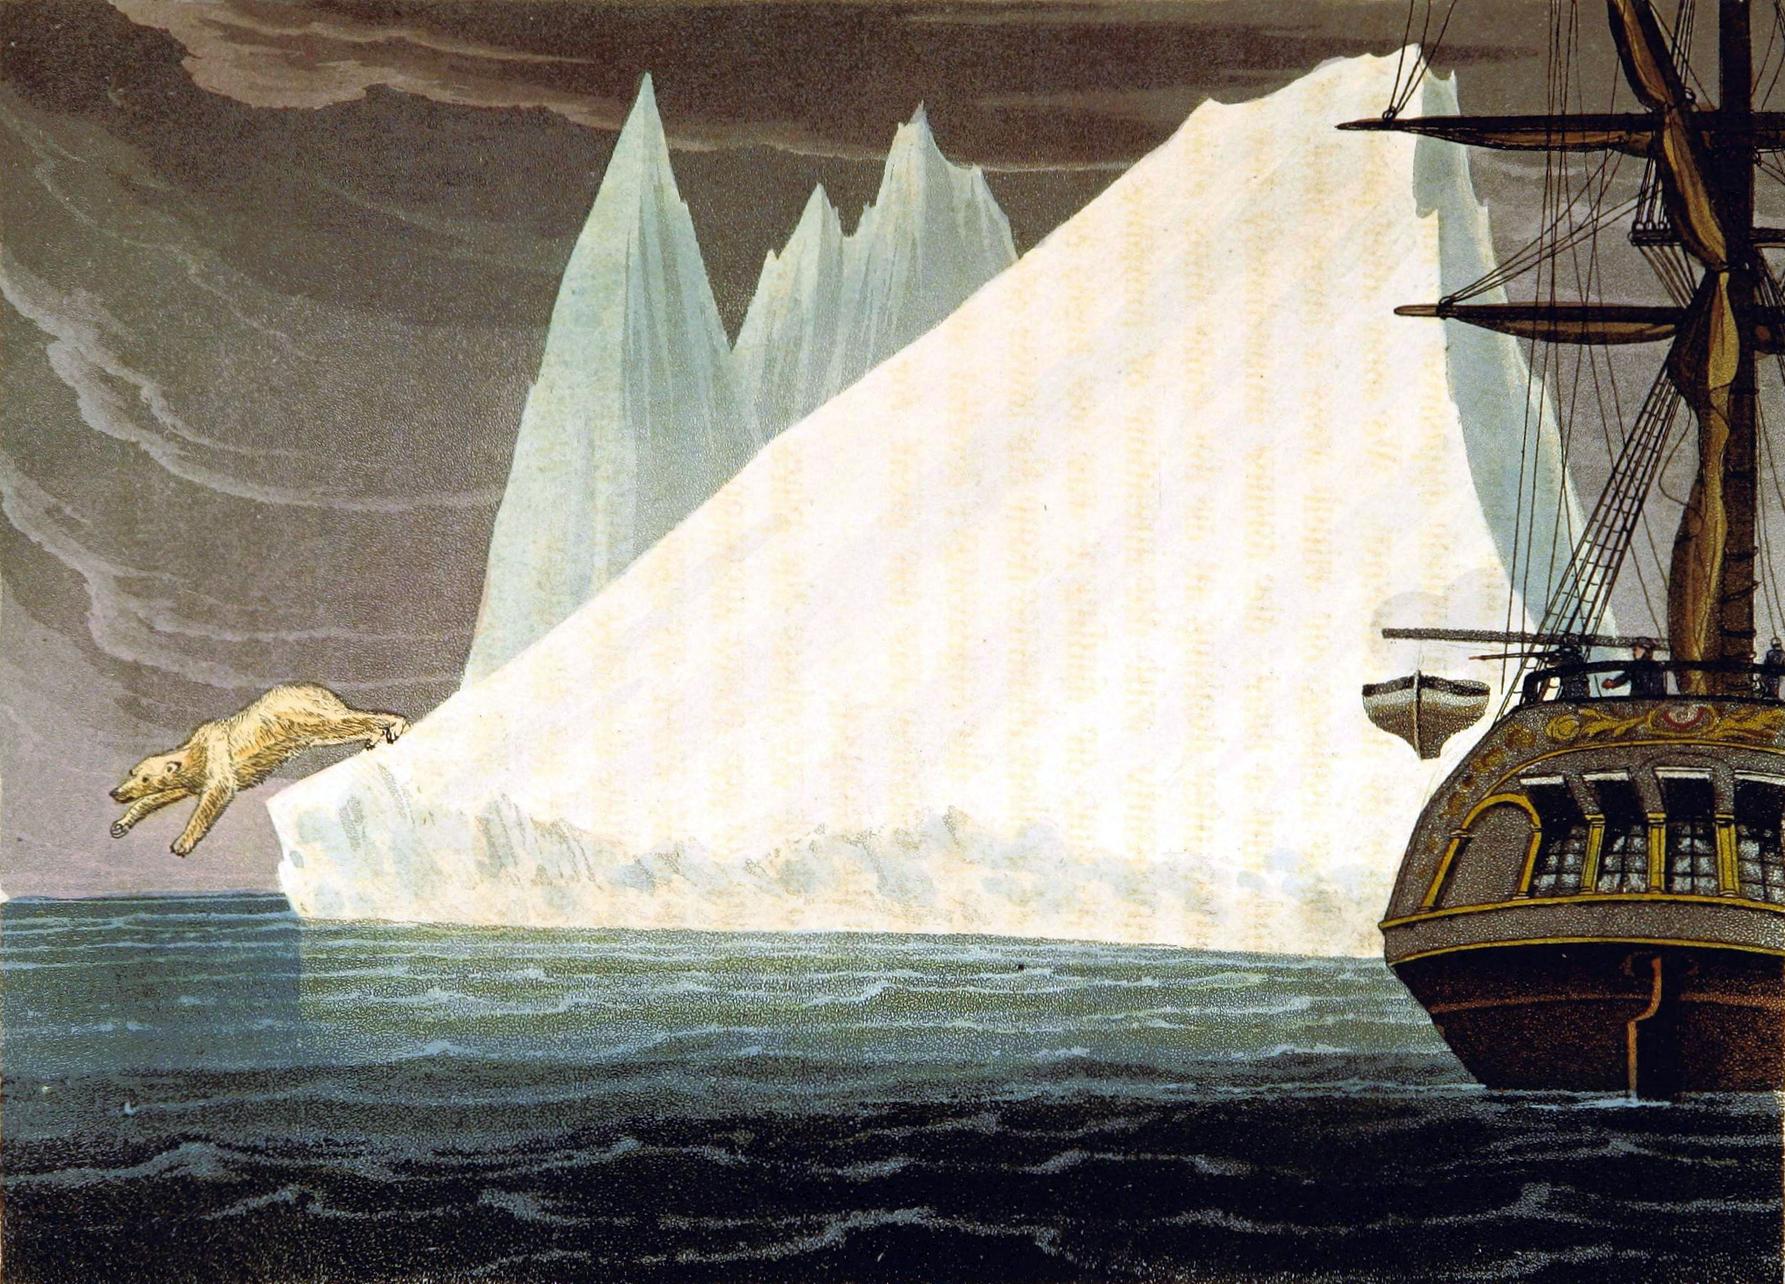 Public domain iceberg illustrations with polar bear. 19th century! Free to use.